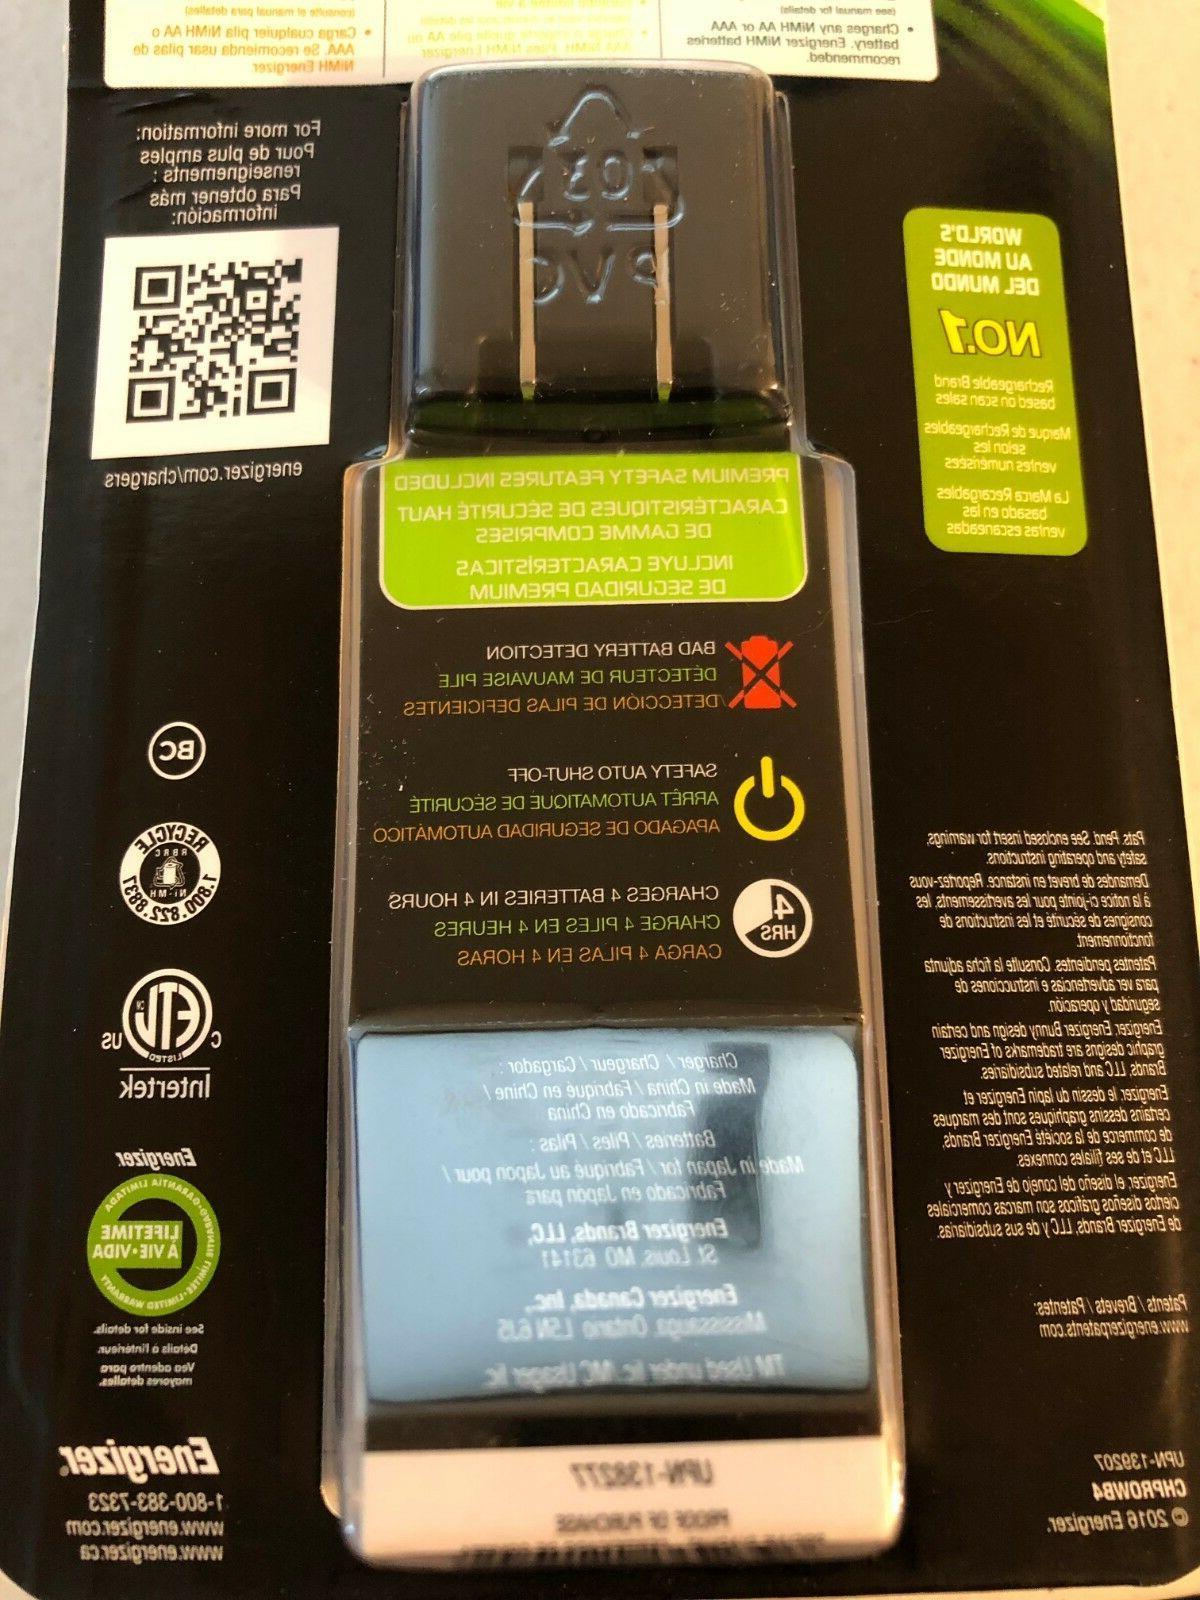 Energizer Rechargeable AA AAA Battery Charger 4 AA NiMH